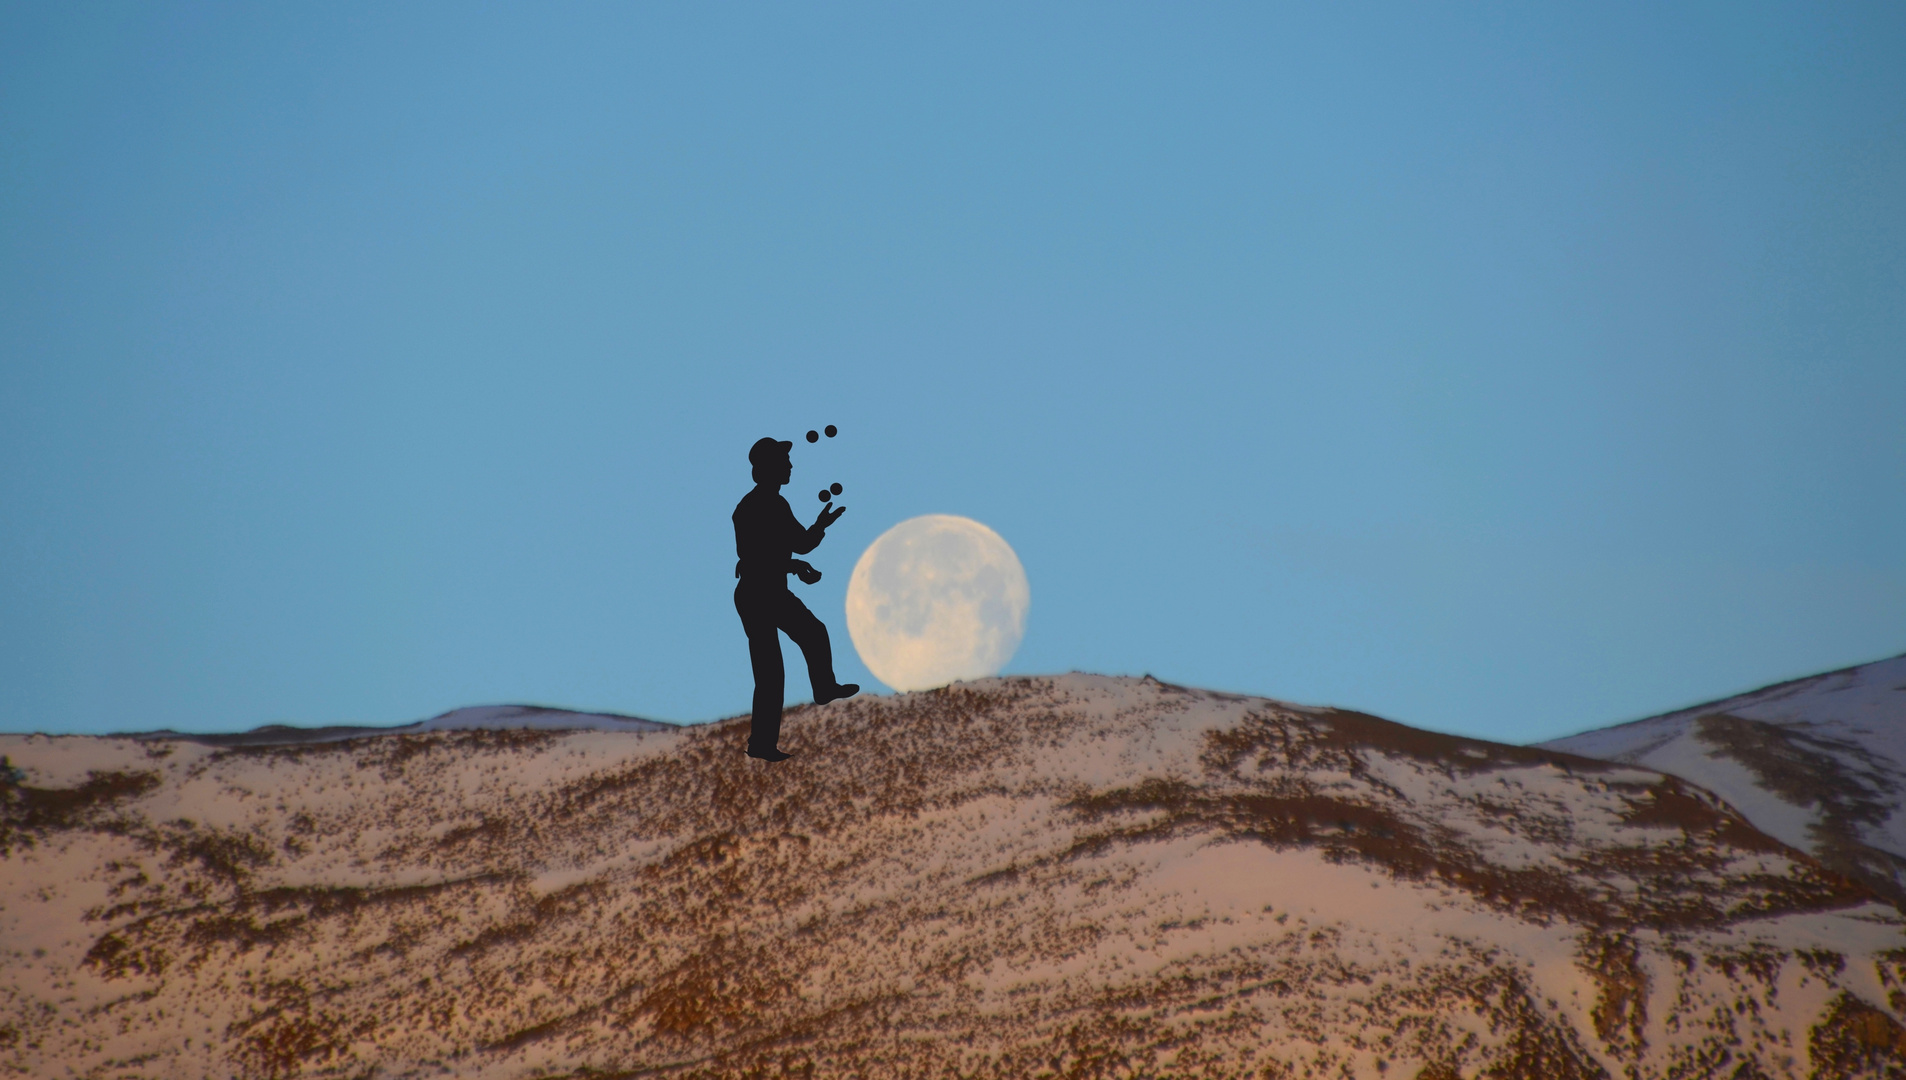 * le jongleur  de lune *